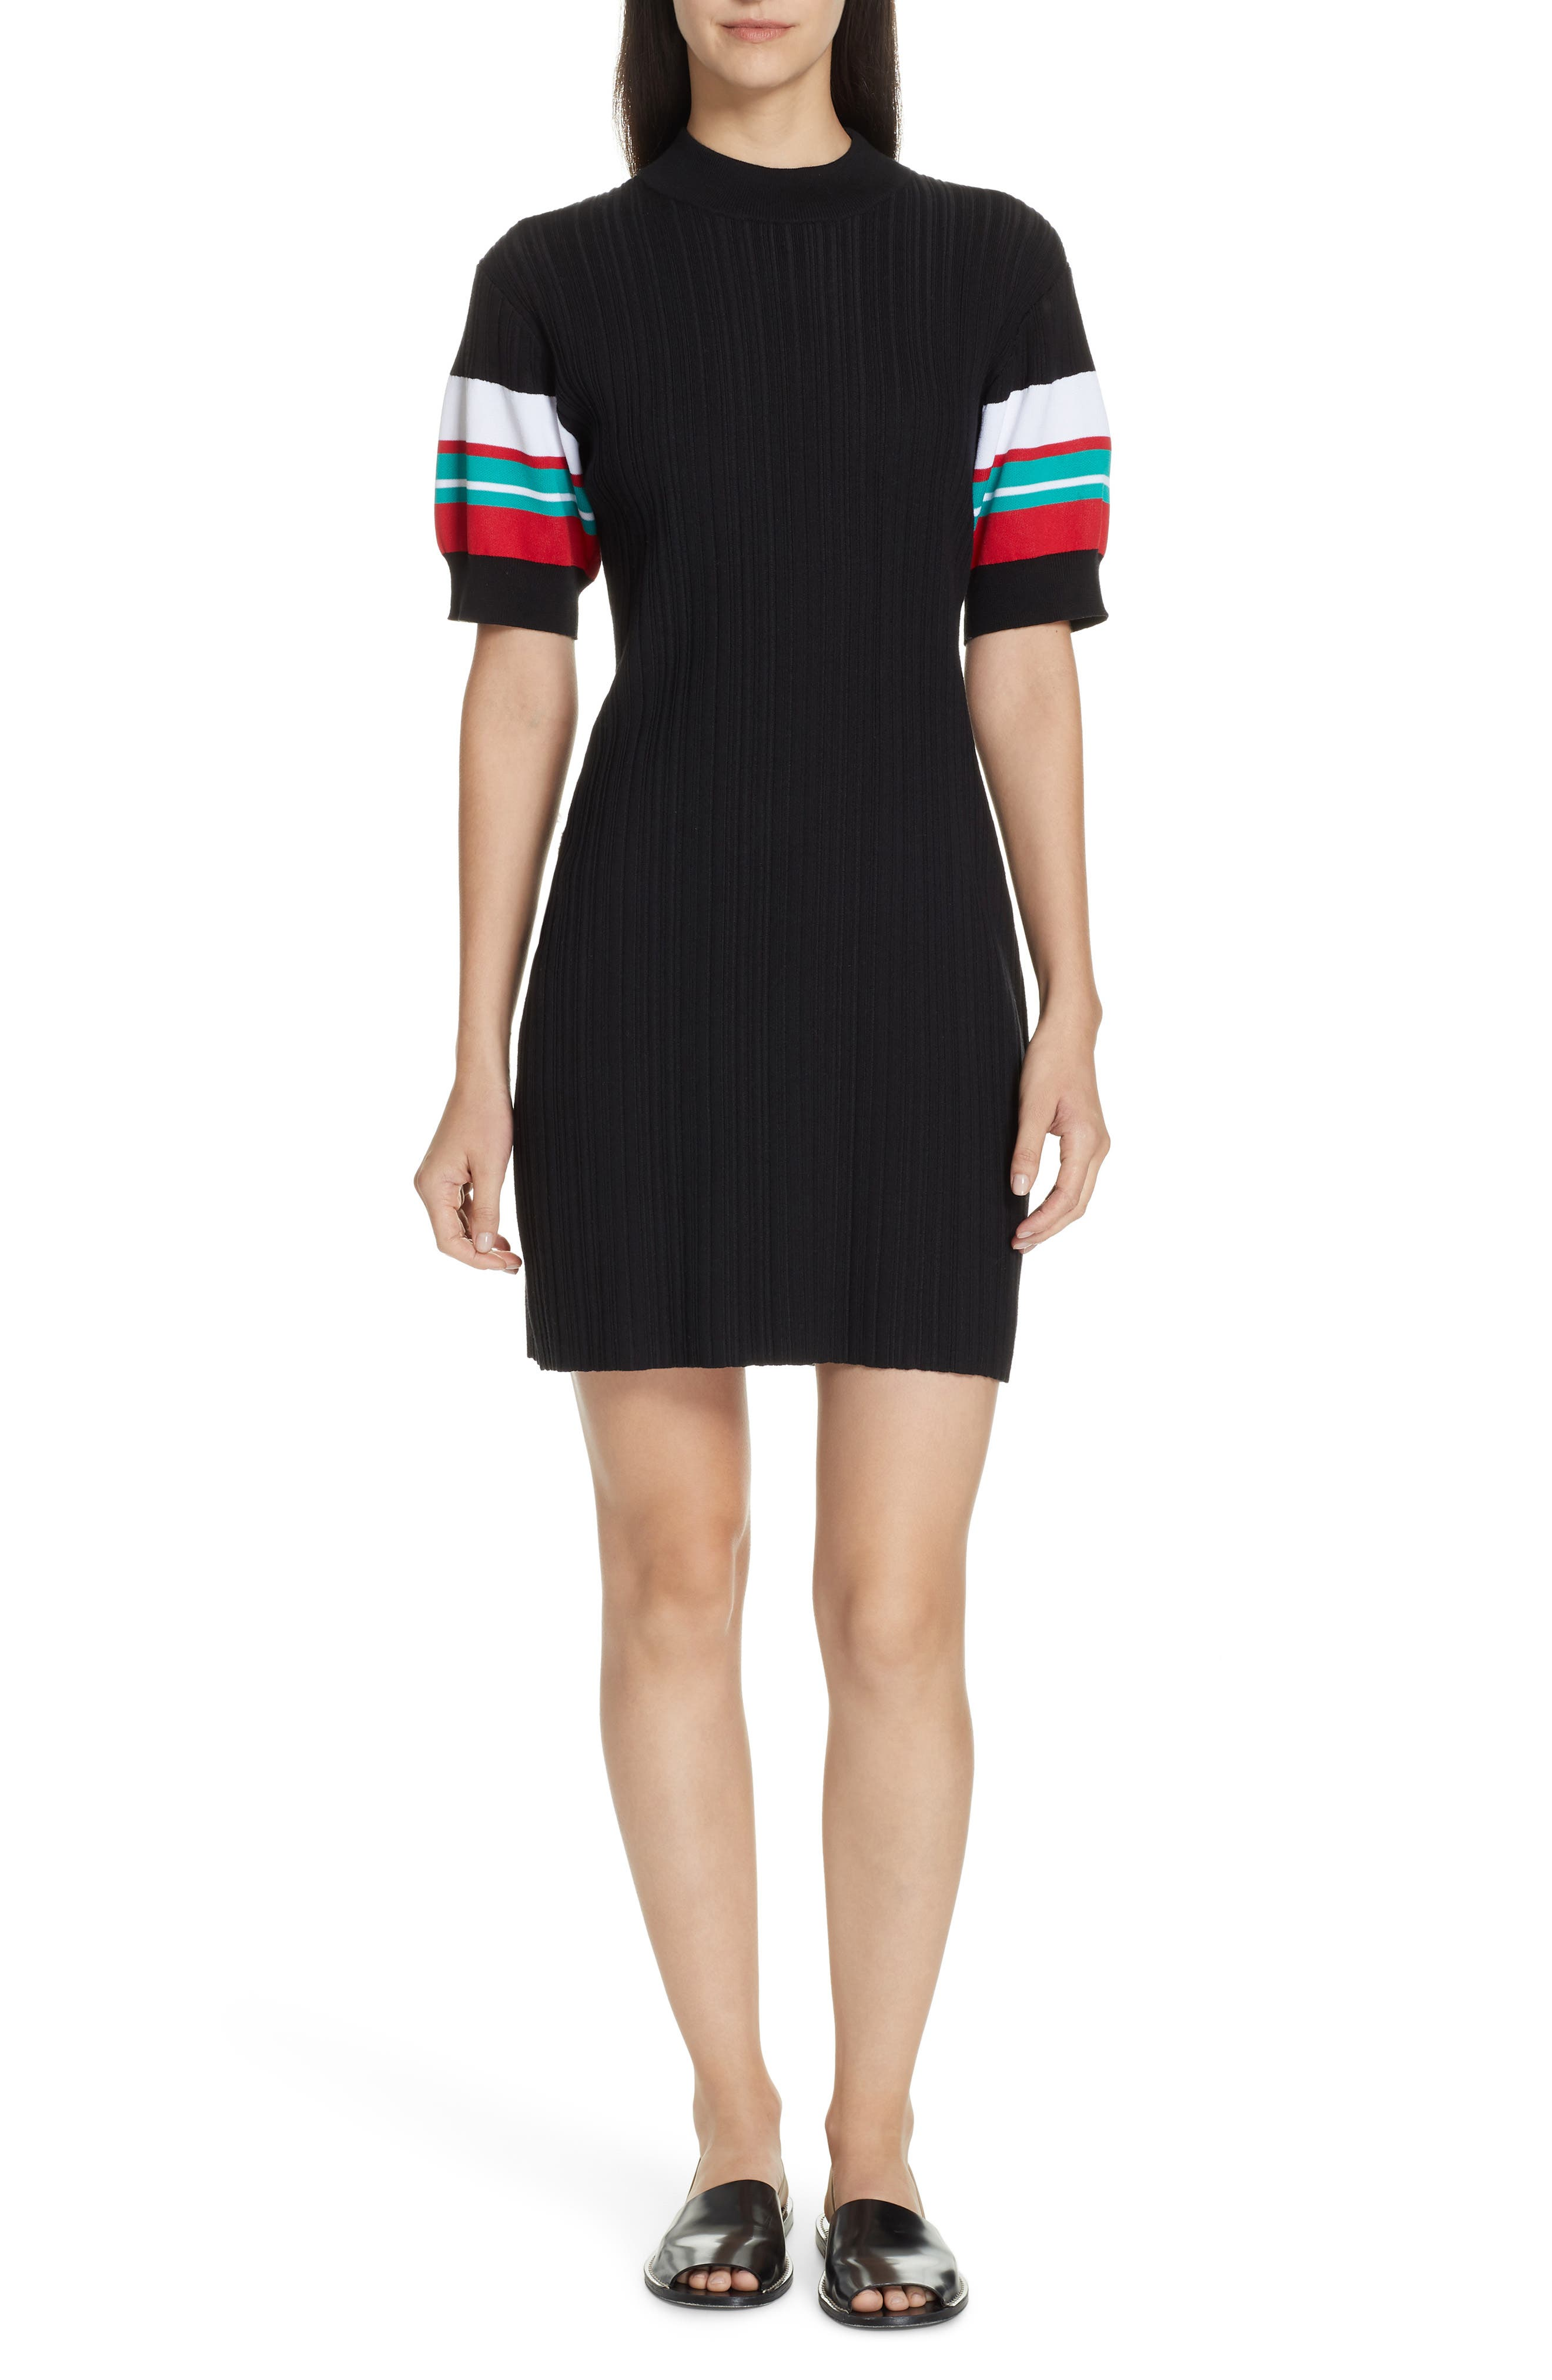 Proenza Schouler Pswl Stripe Sleeve Ribbed Dress, Black